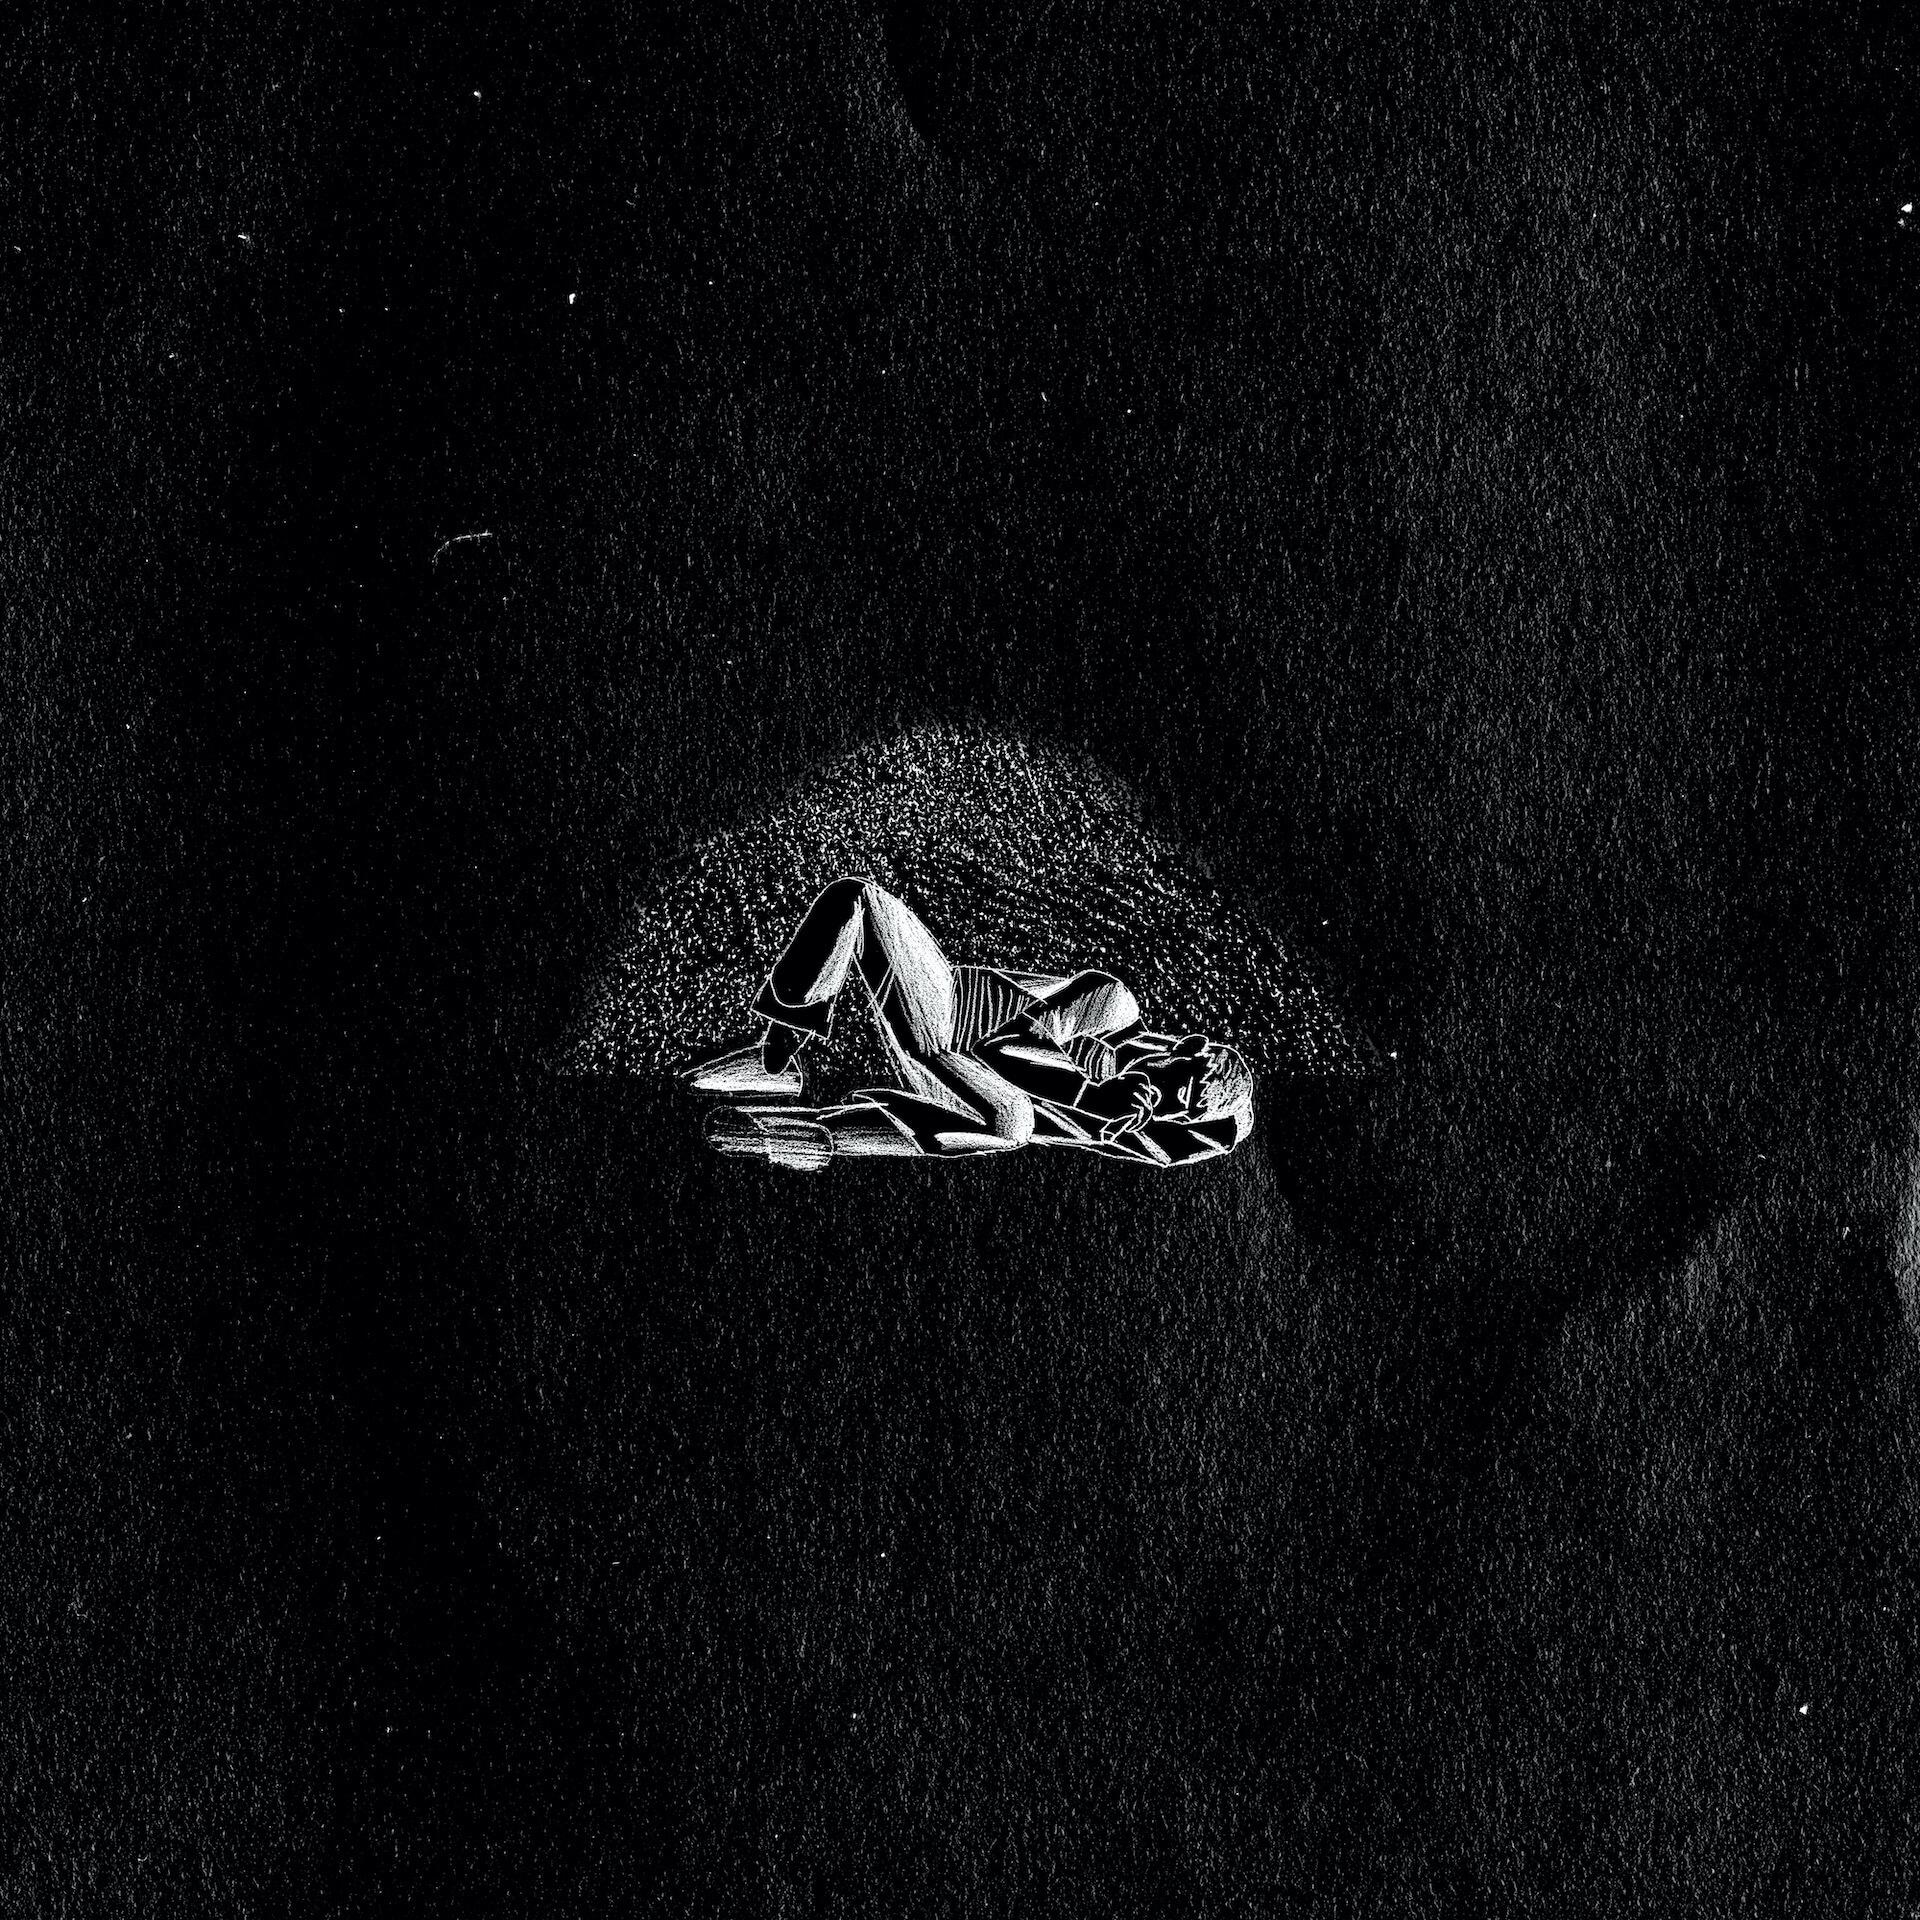 King Kruleのライブアルバム『You Heat Me Up, You Cool Me Down』が発売決定!幻のツアーが初の音源化 music210902_king_kruule_2